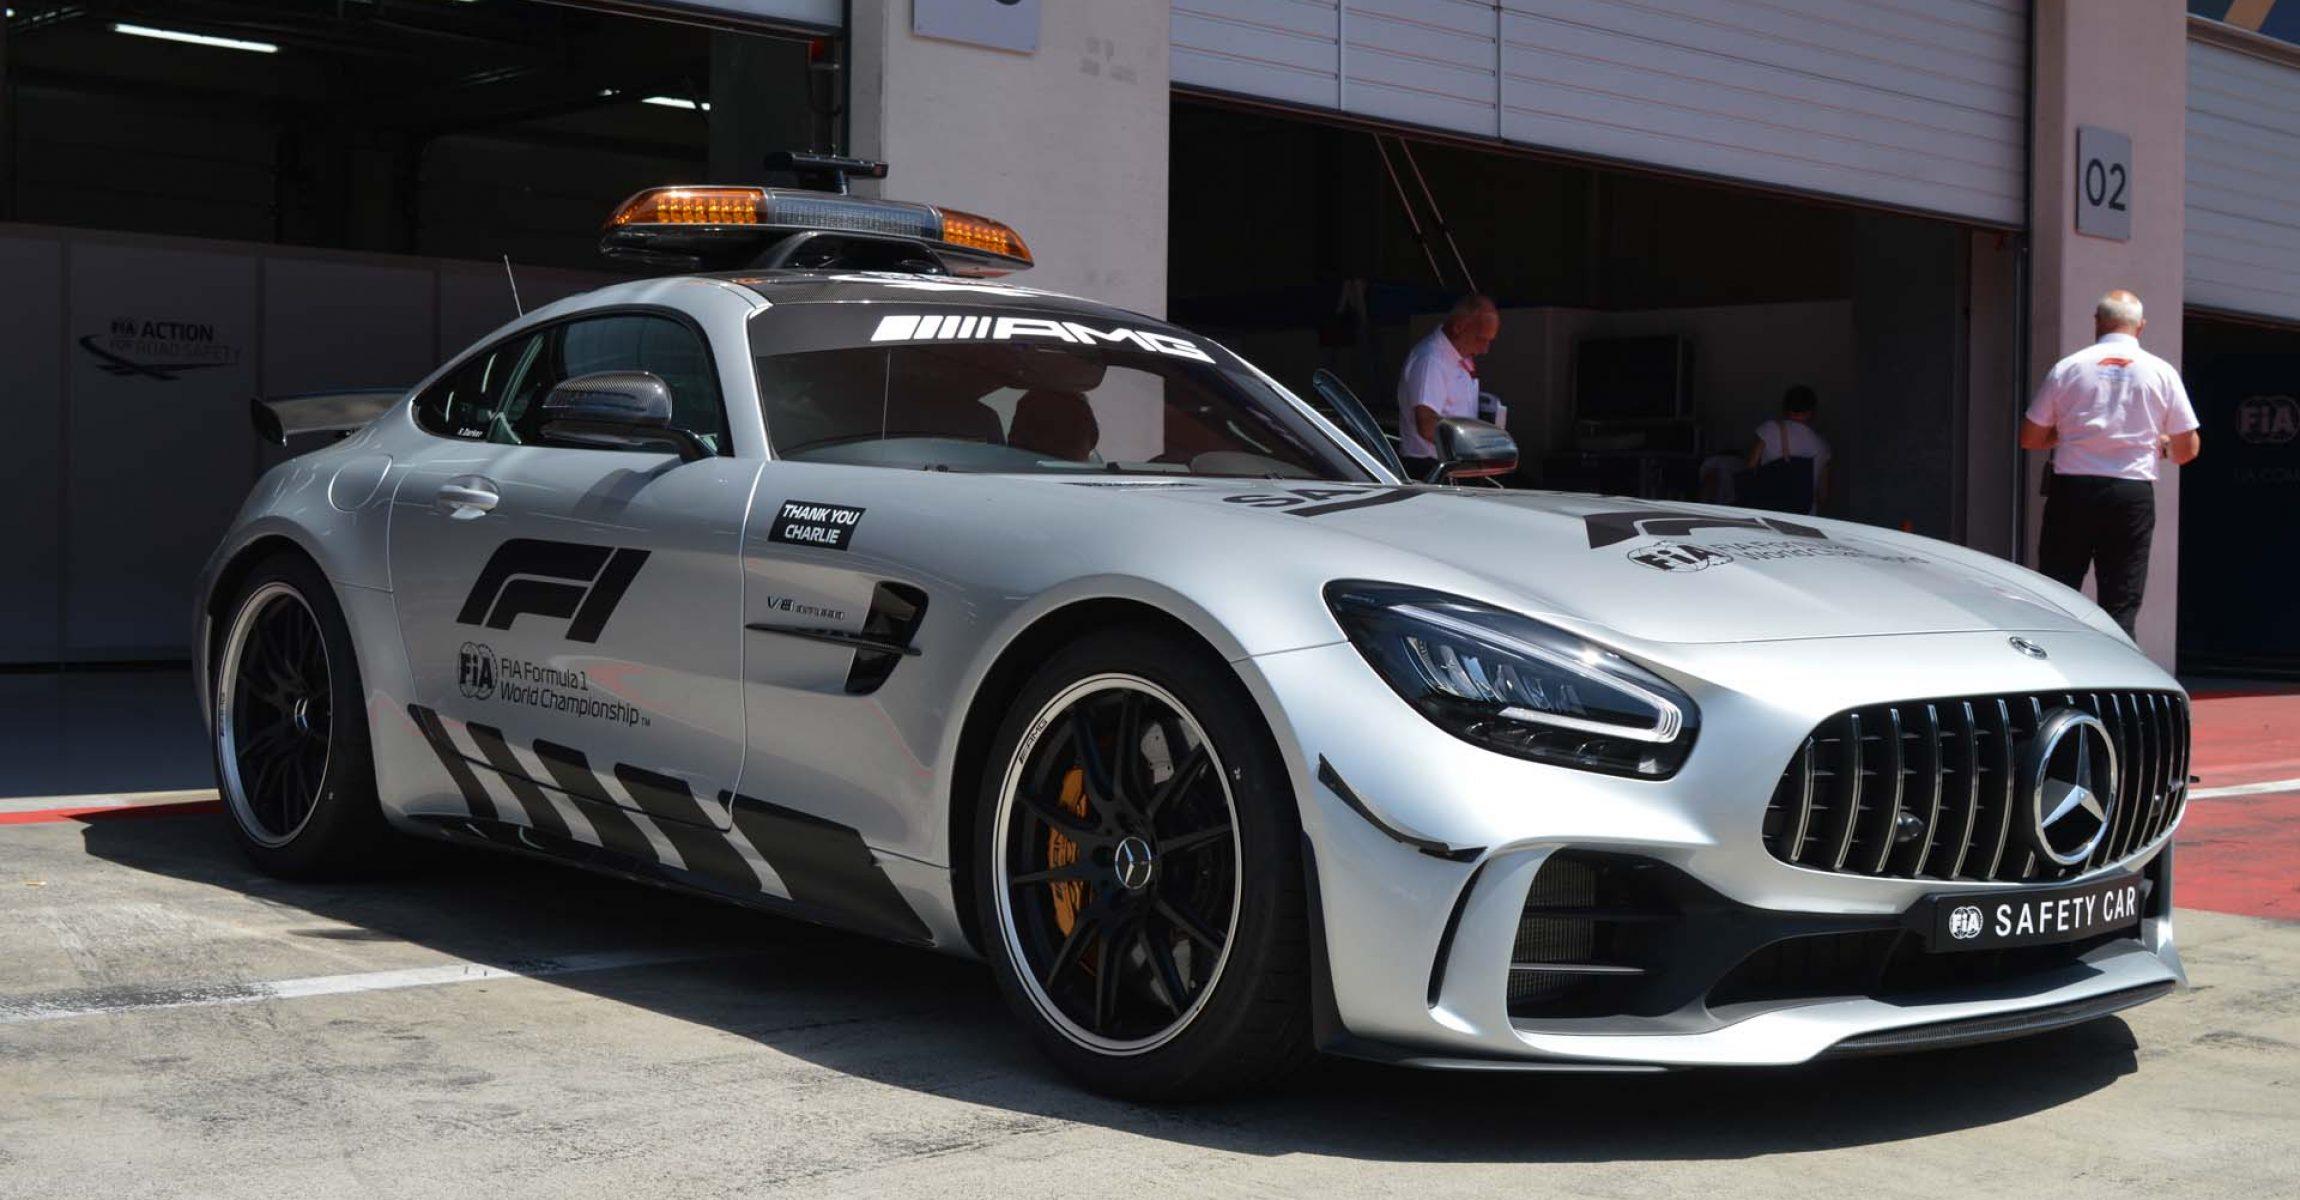 Safety Car, Mercedes